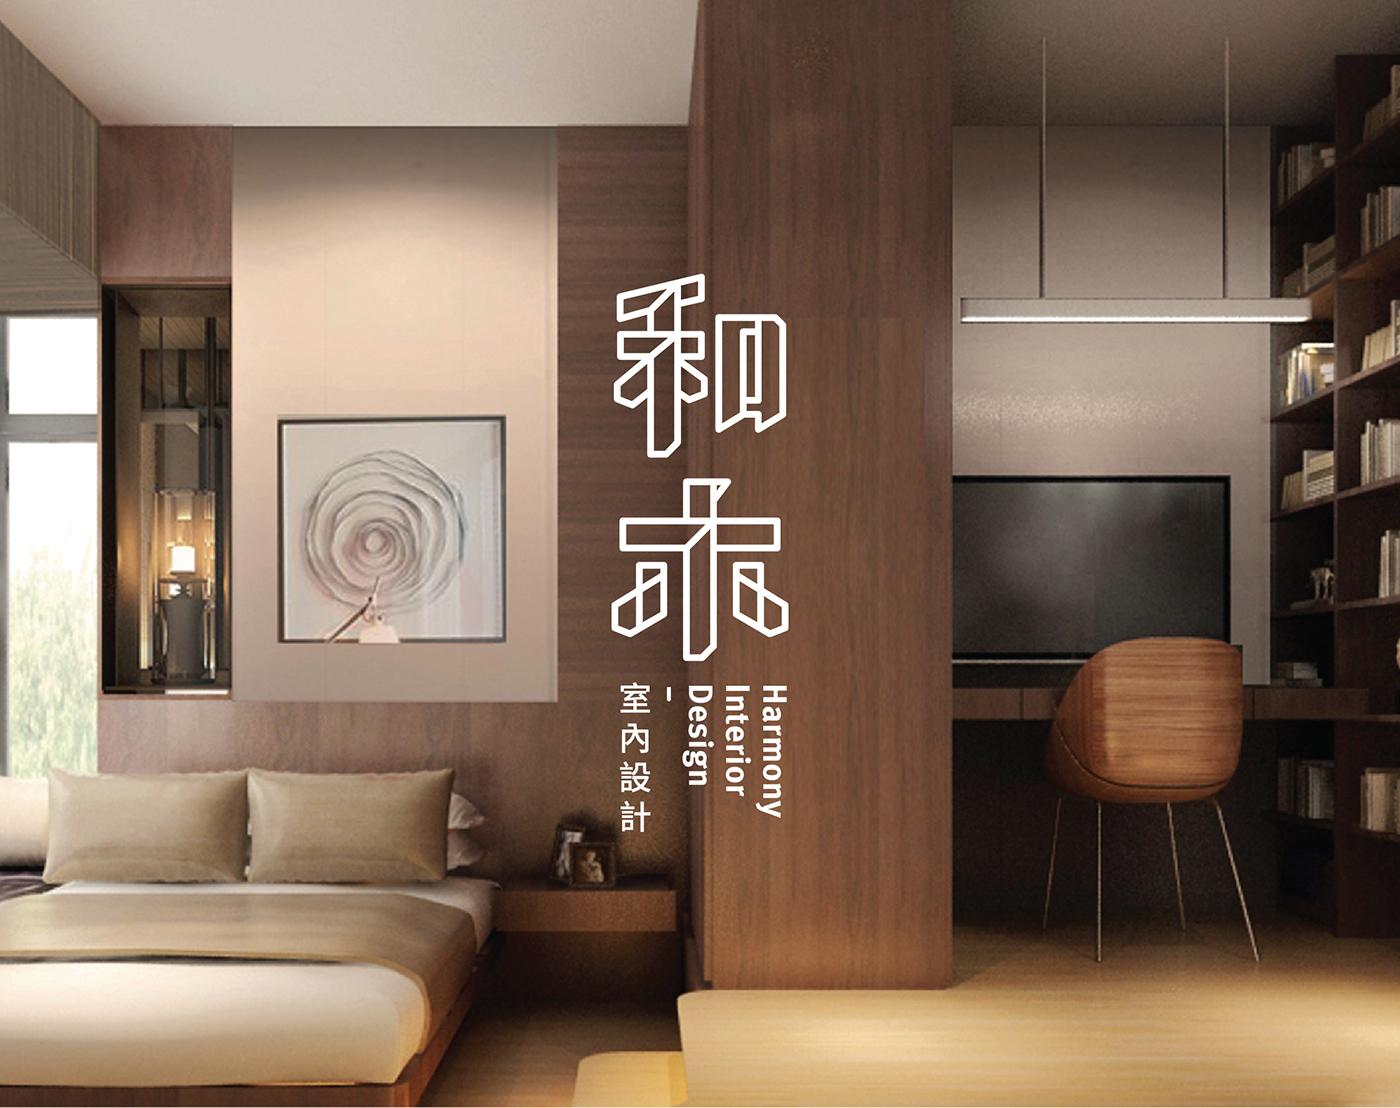 Harmony interior design vi on behance - Harmony in interior design ...